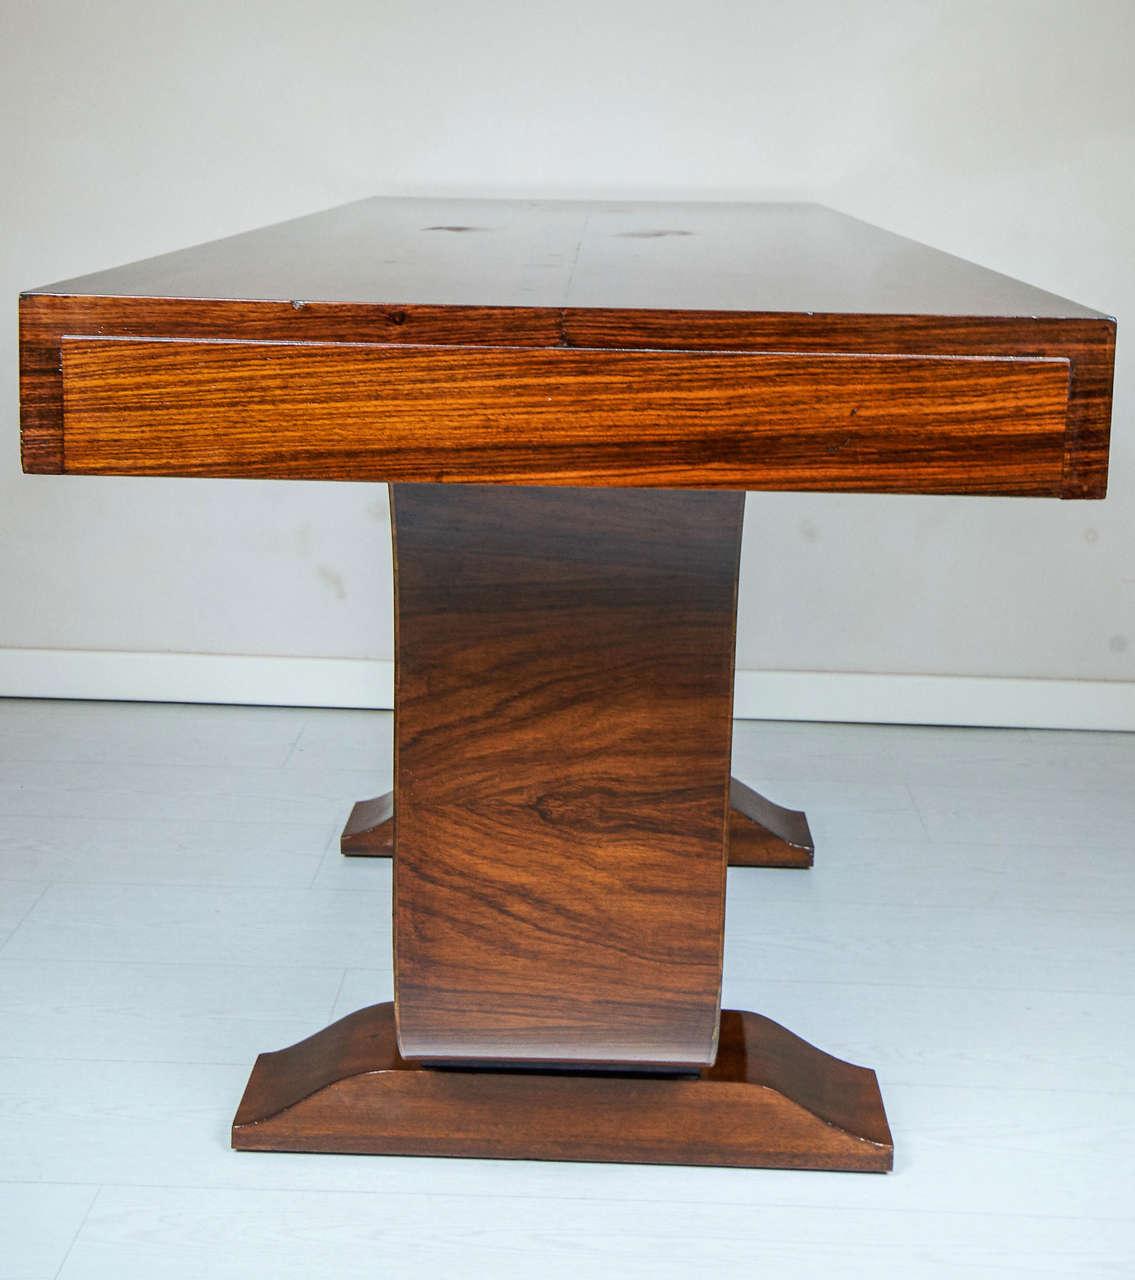 elegant art deco console table 1930 at 1stdibs. Black Bedroom Furniture Sets. Home Design Ideas